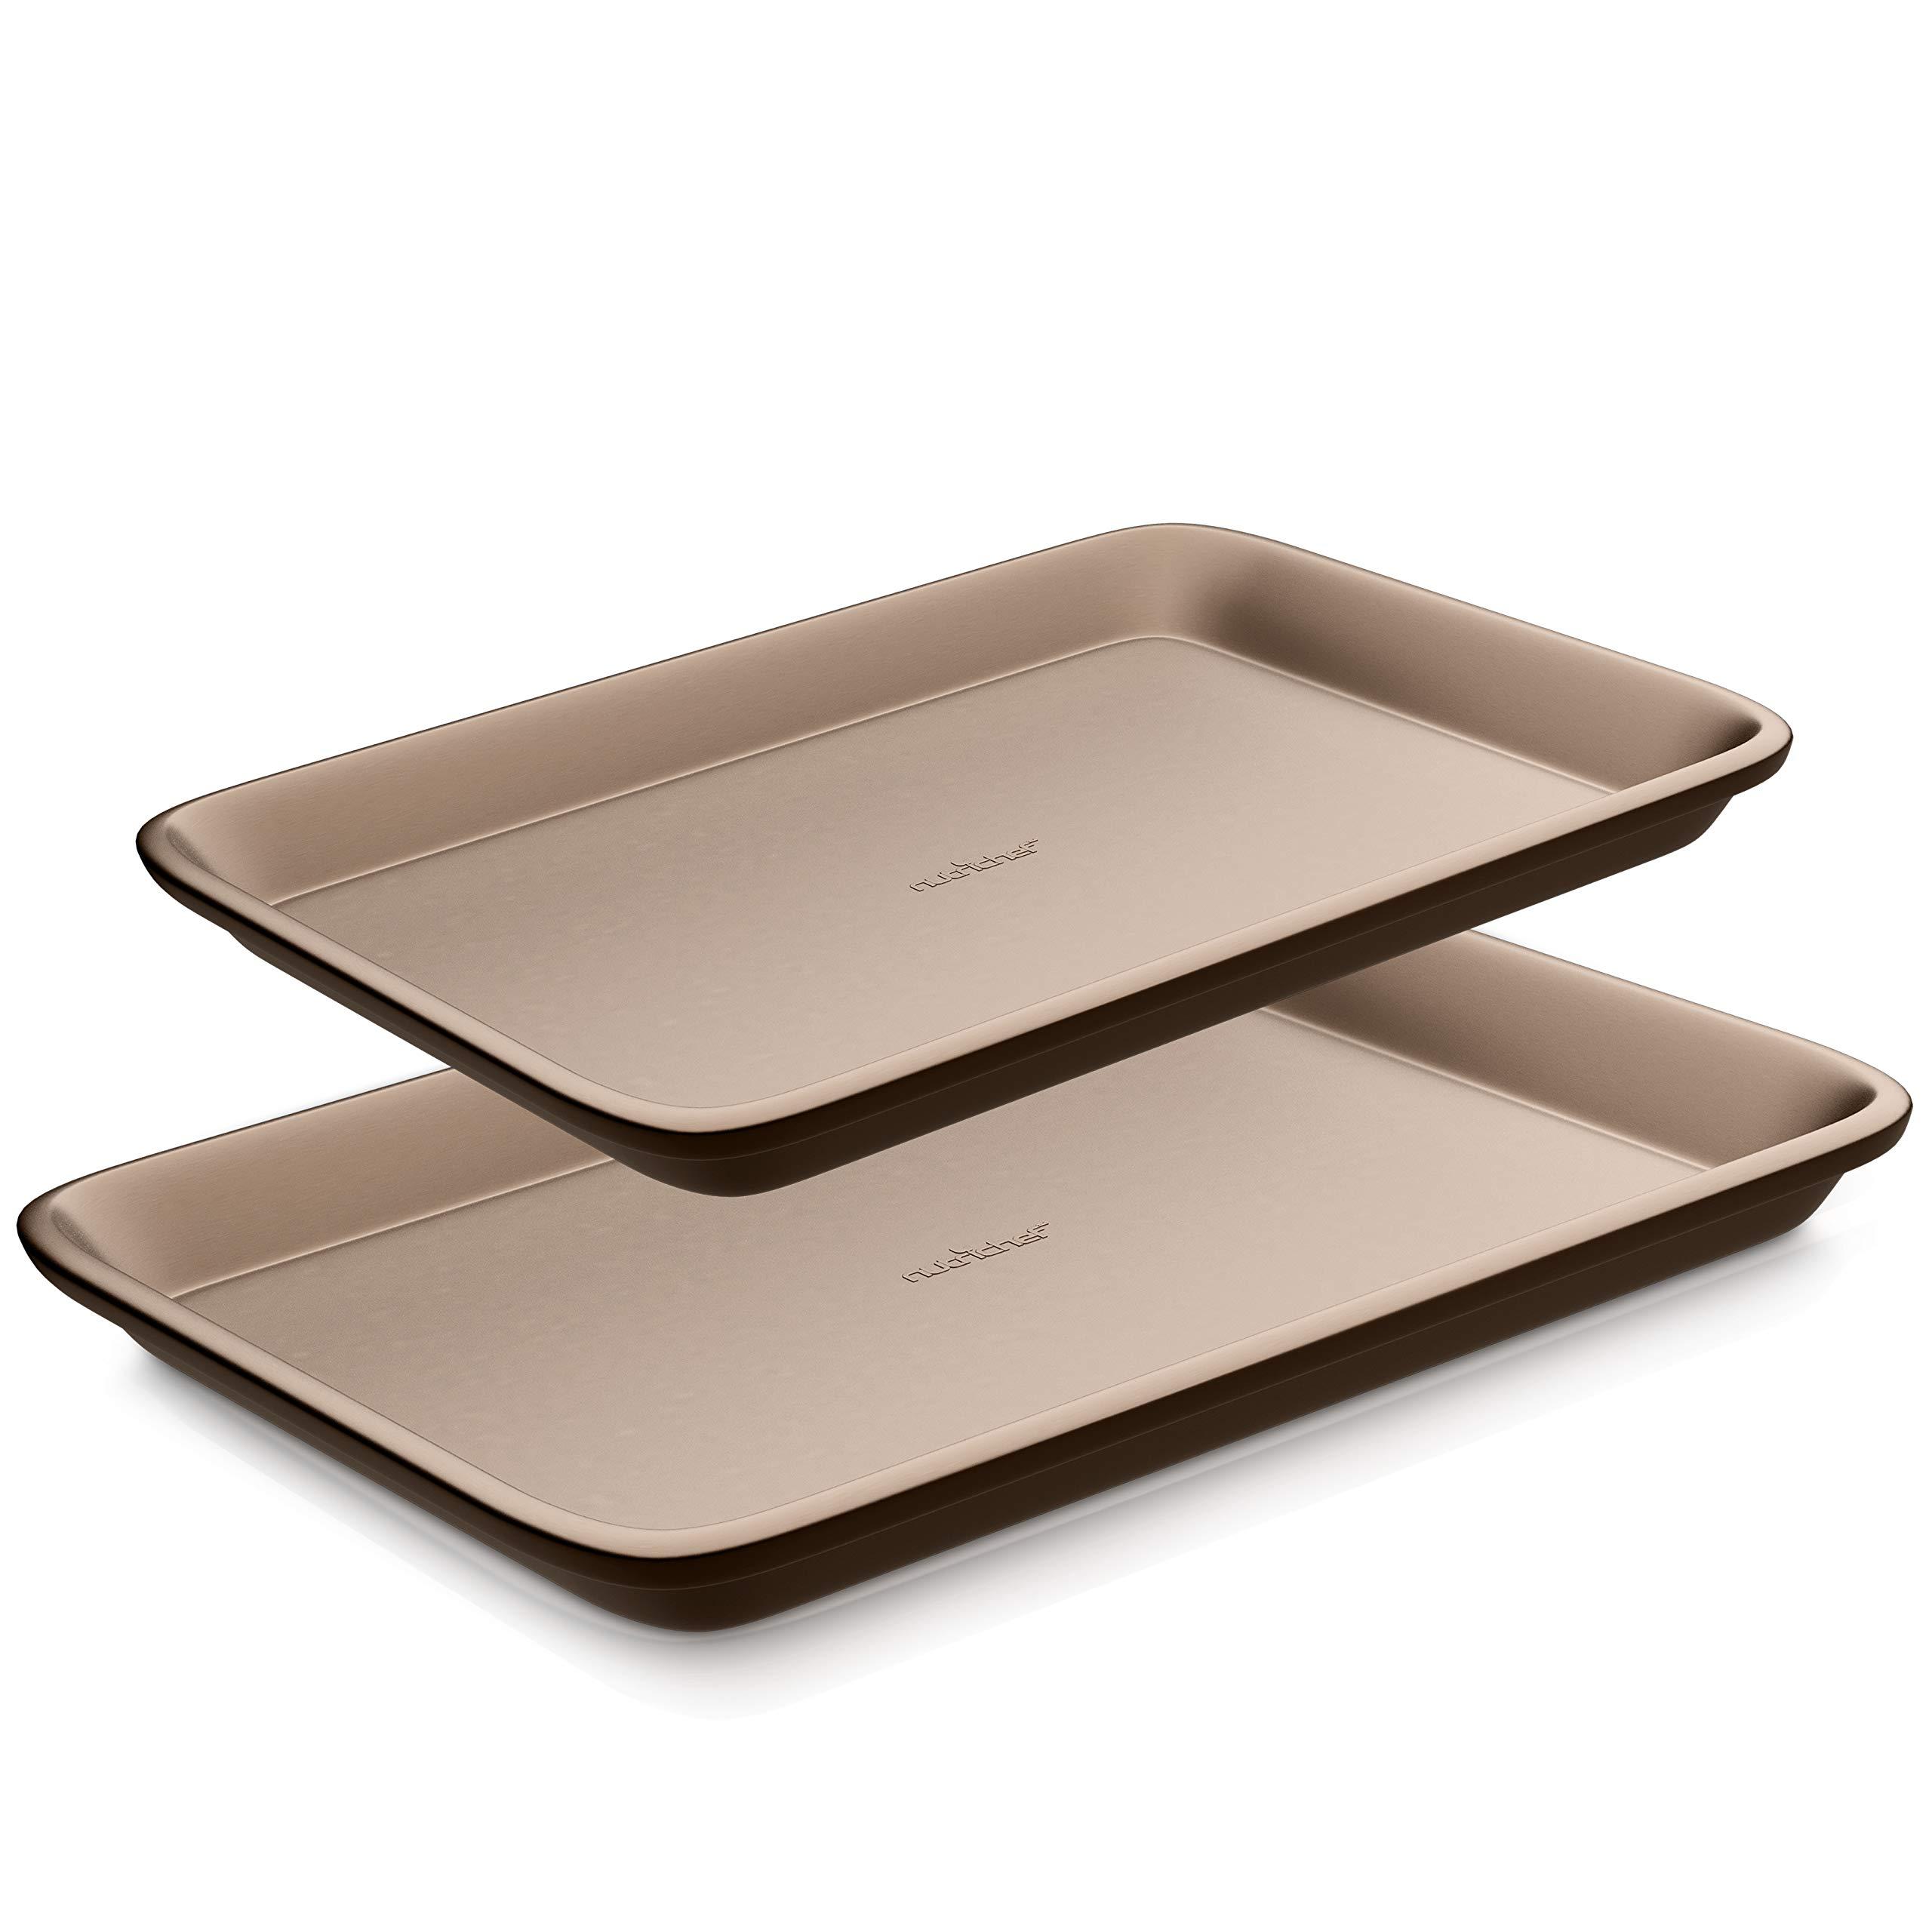 NutriChef NC2TRBK1 2-Pcs Set-Nonstick Baking, Carbon Steel Pan Cookie Sheet w/Rimmed Border, Metal, Reusable, Quality Kitchenwa, L :15.7'' x 11.0' - S: 13.4'' x 9.6', Rose Gold